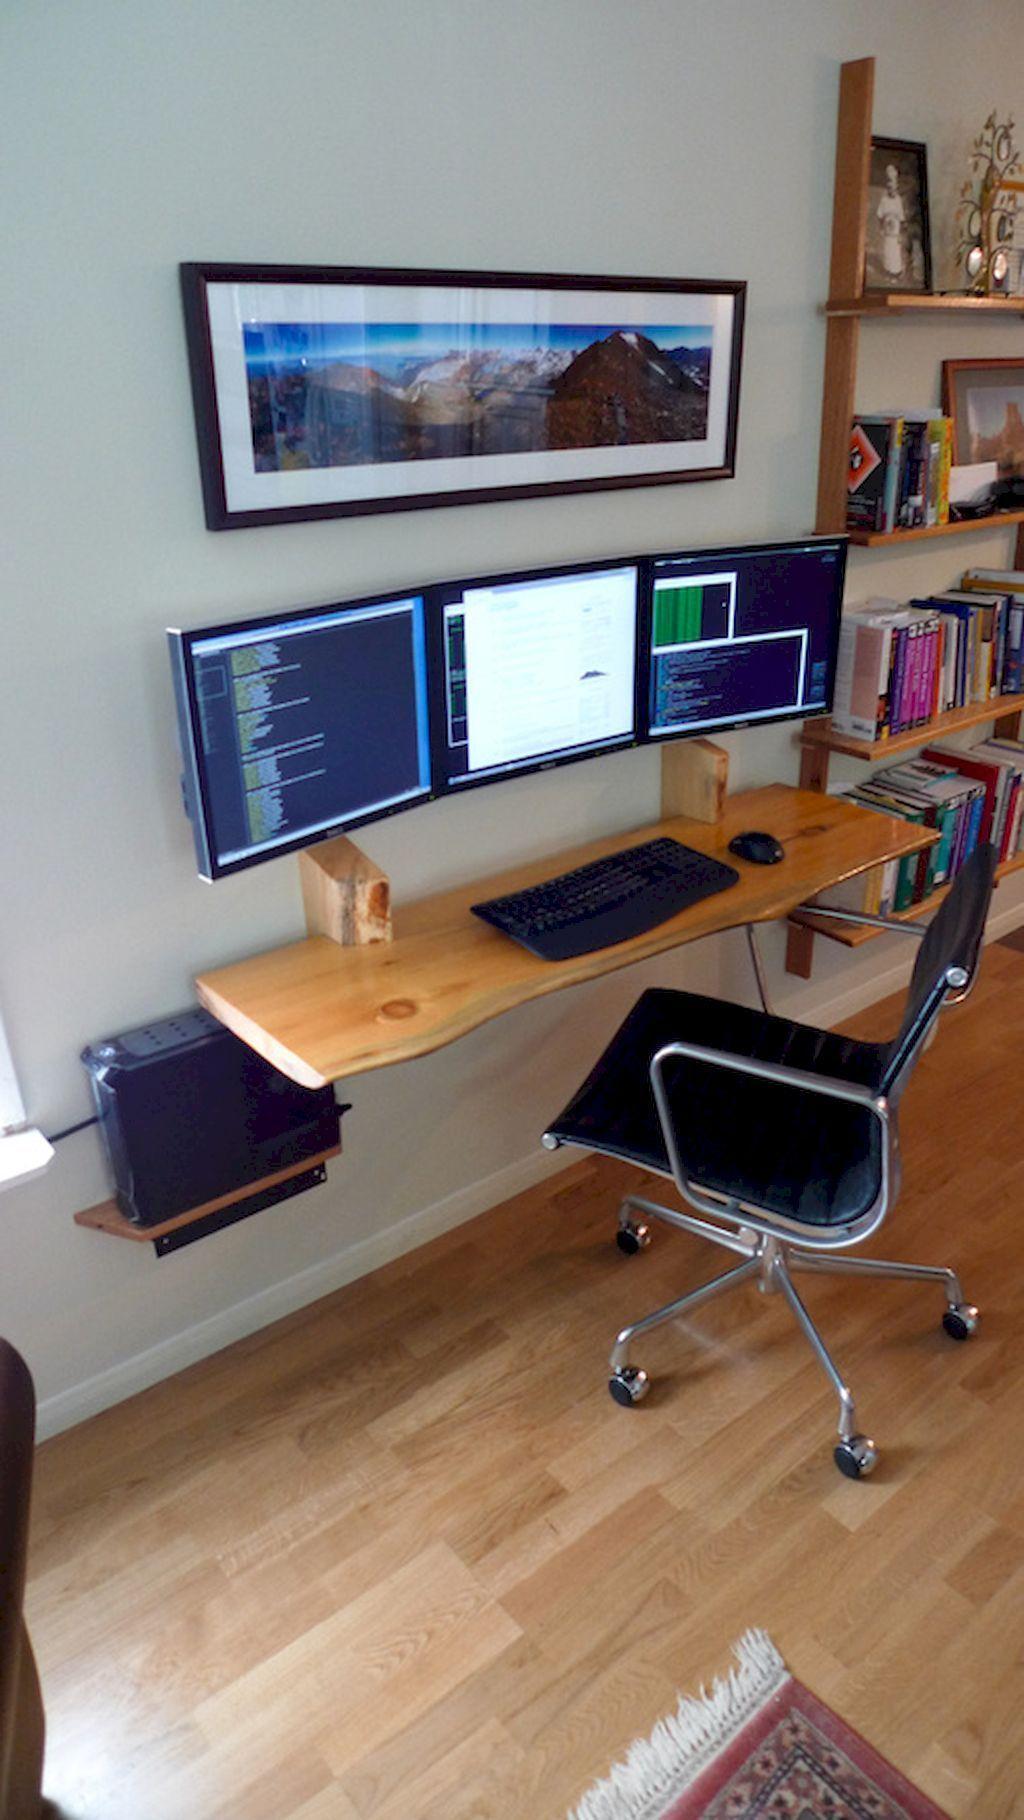 Fabulous Modern Desk Ideas For Functional And Enjoyable Office Diy Design Mid Century Metal Minimali Diy Office Desk Office Desk Designs Computer Desk Design